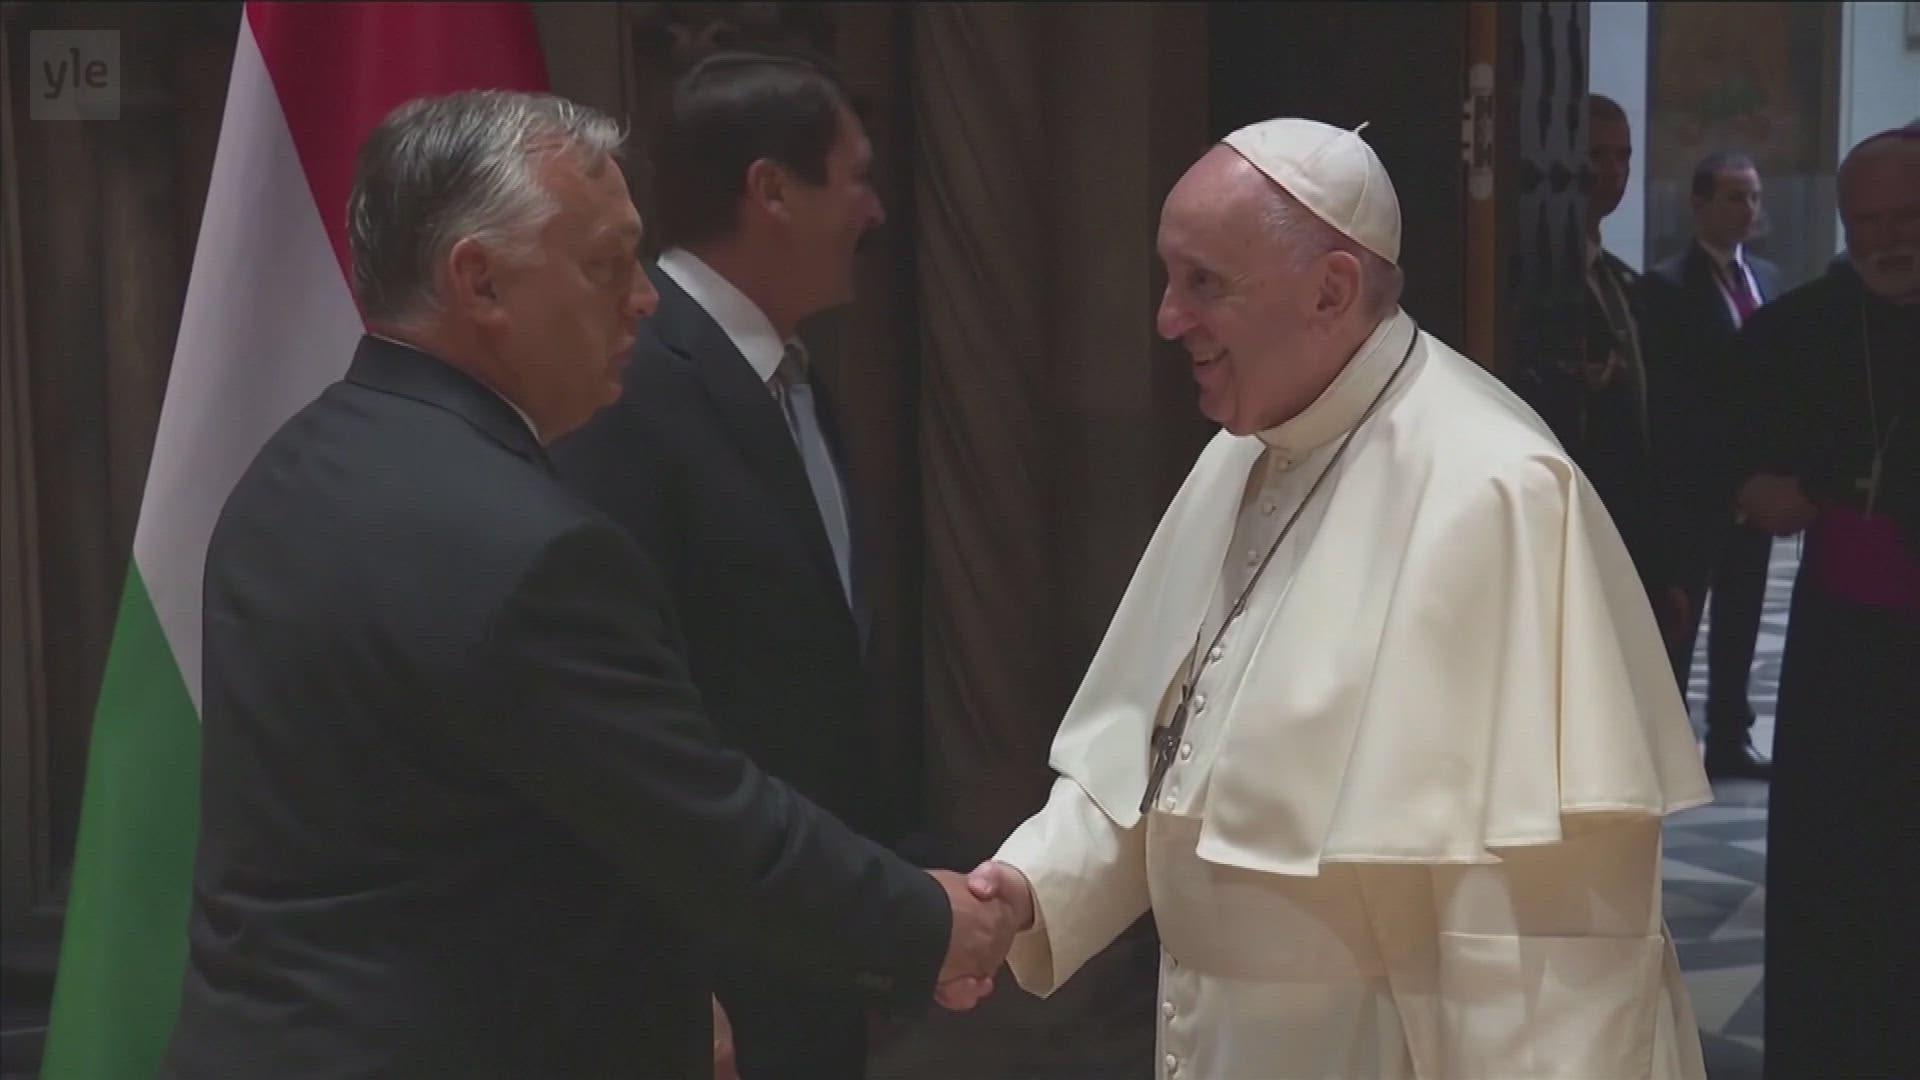 Paavi Franciscus vieraili Unkarissa